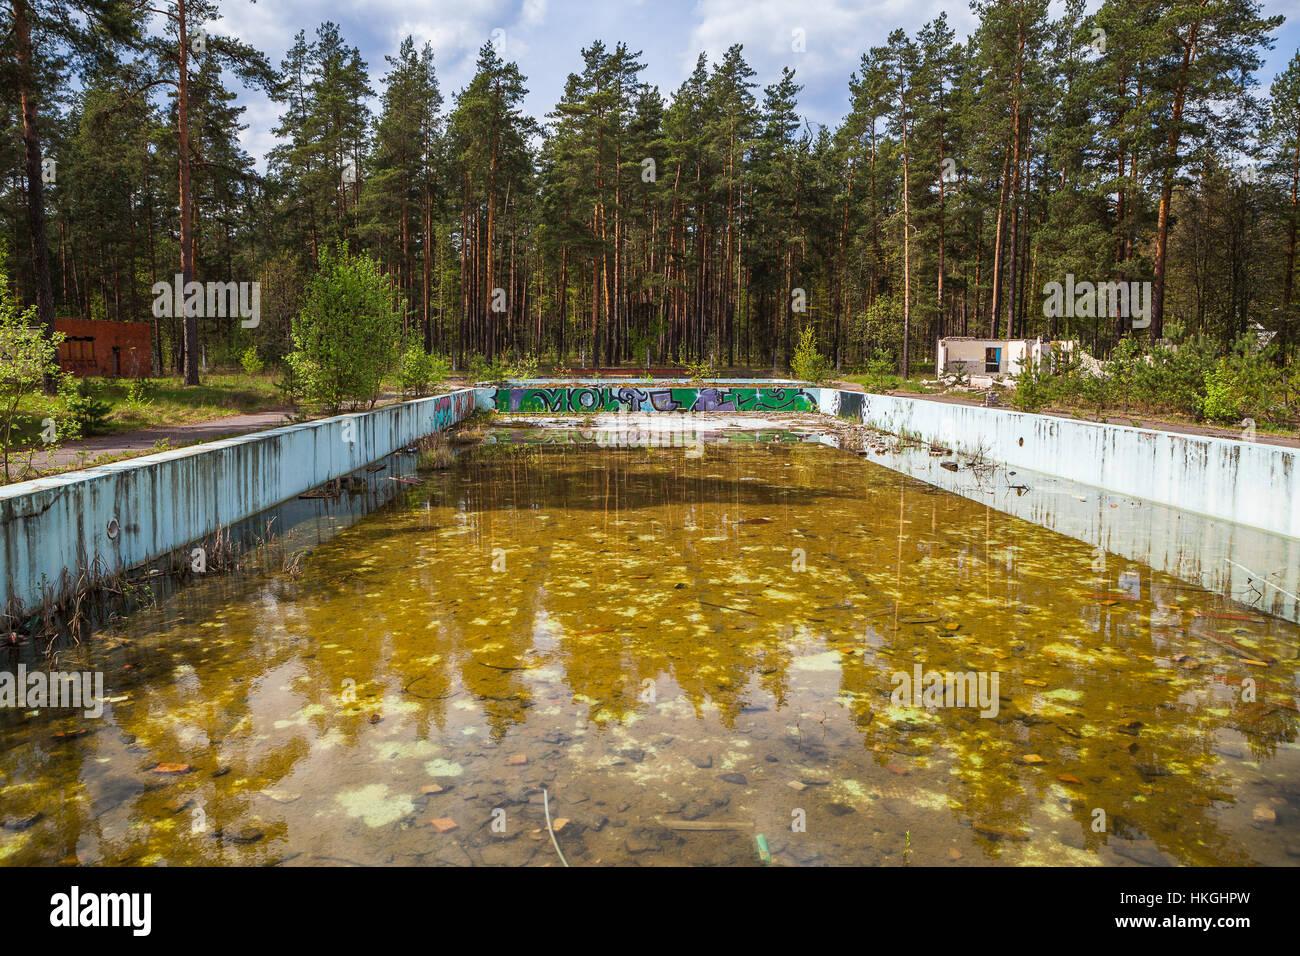 Abandoned Overgrown Outdoor Swimming Pool Stock Photo Alamy